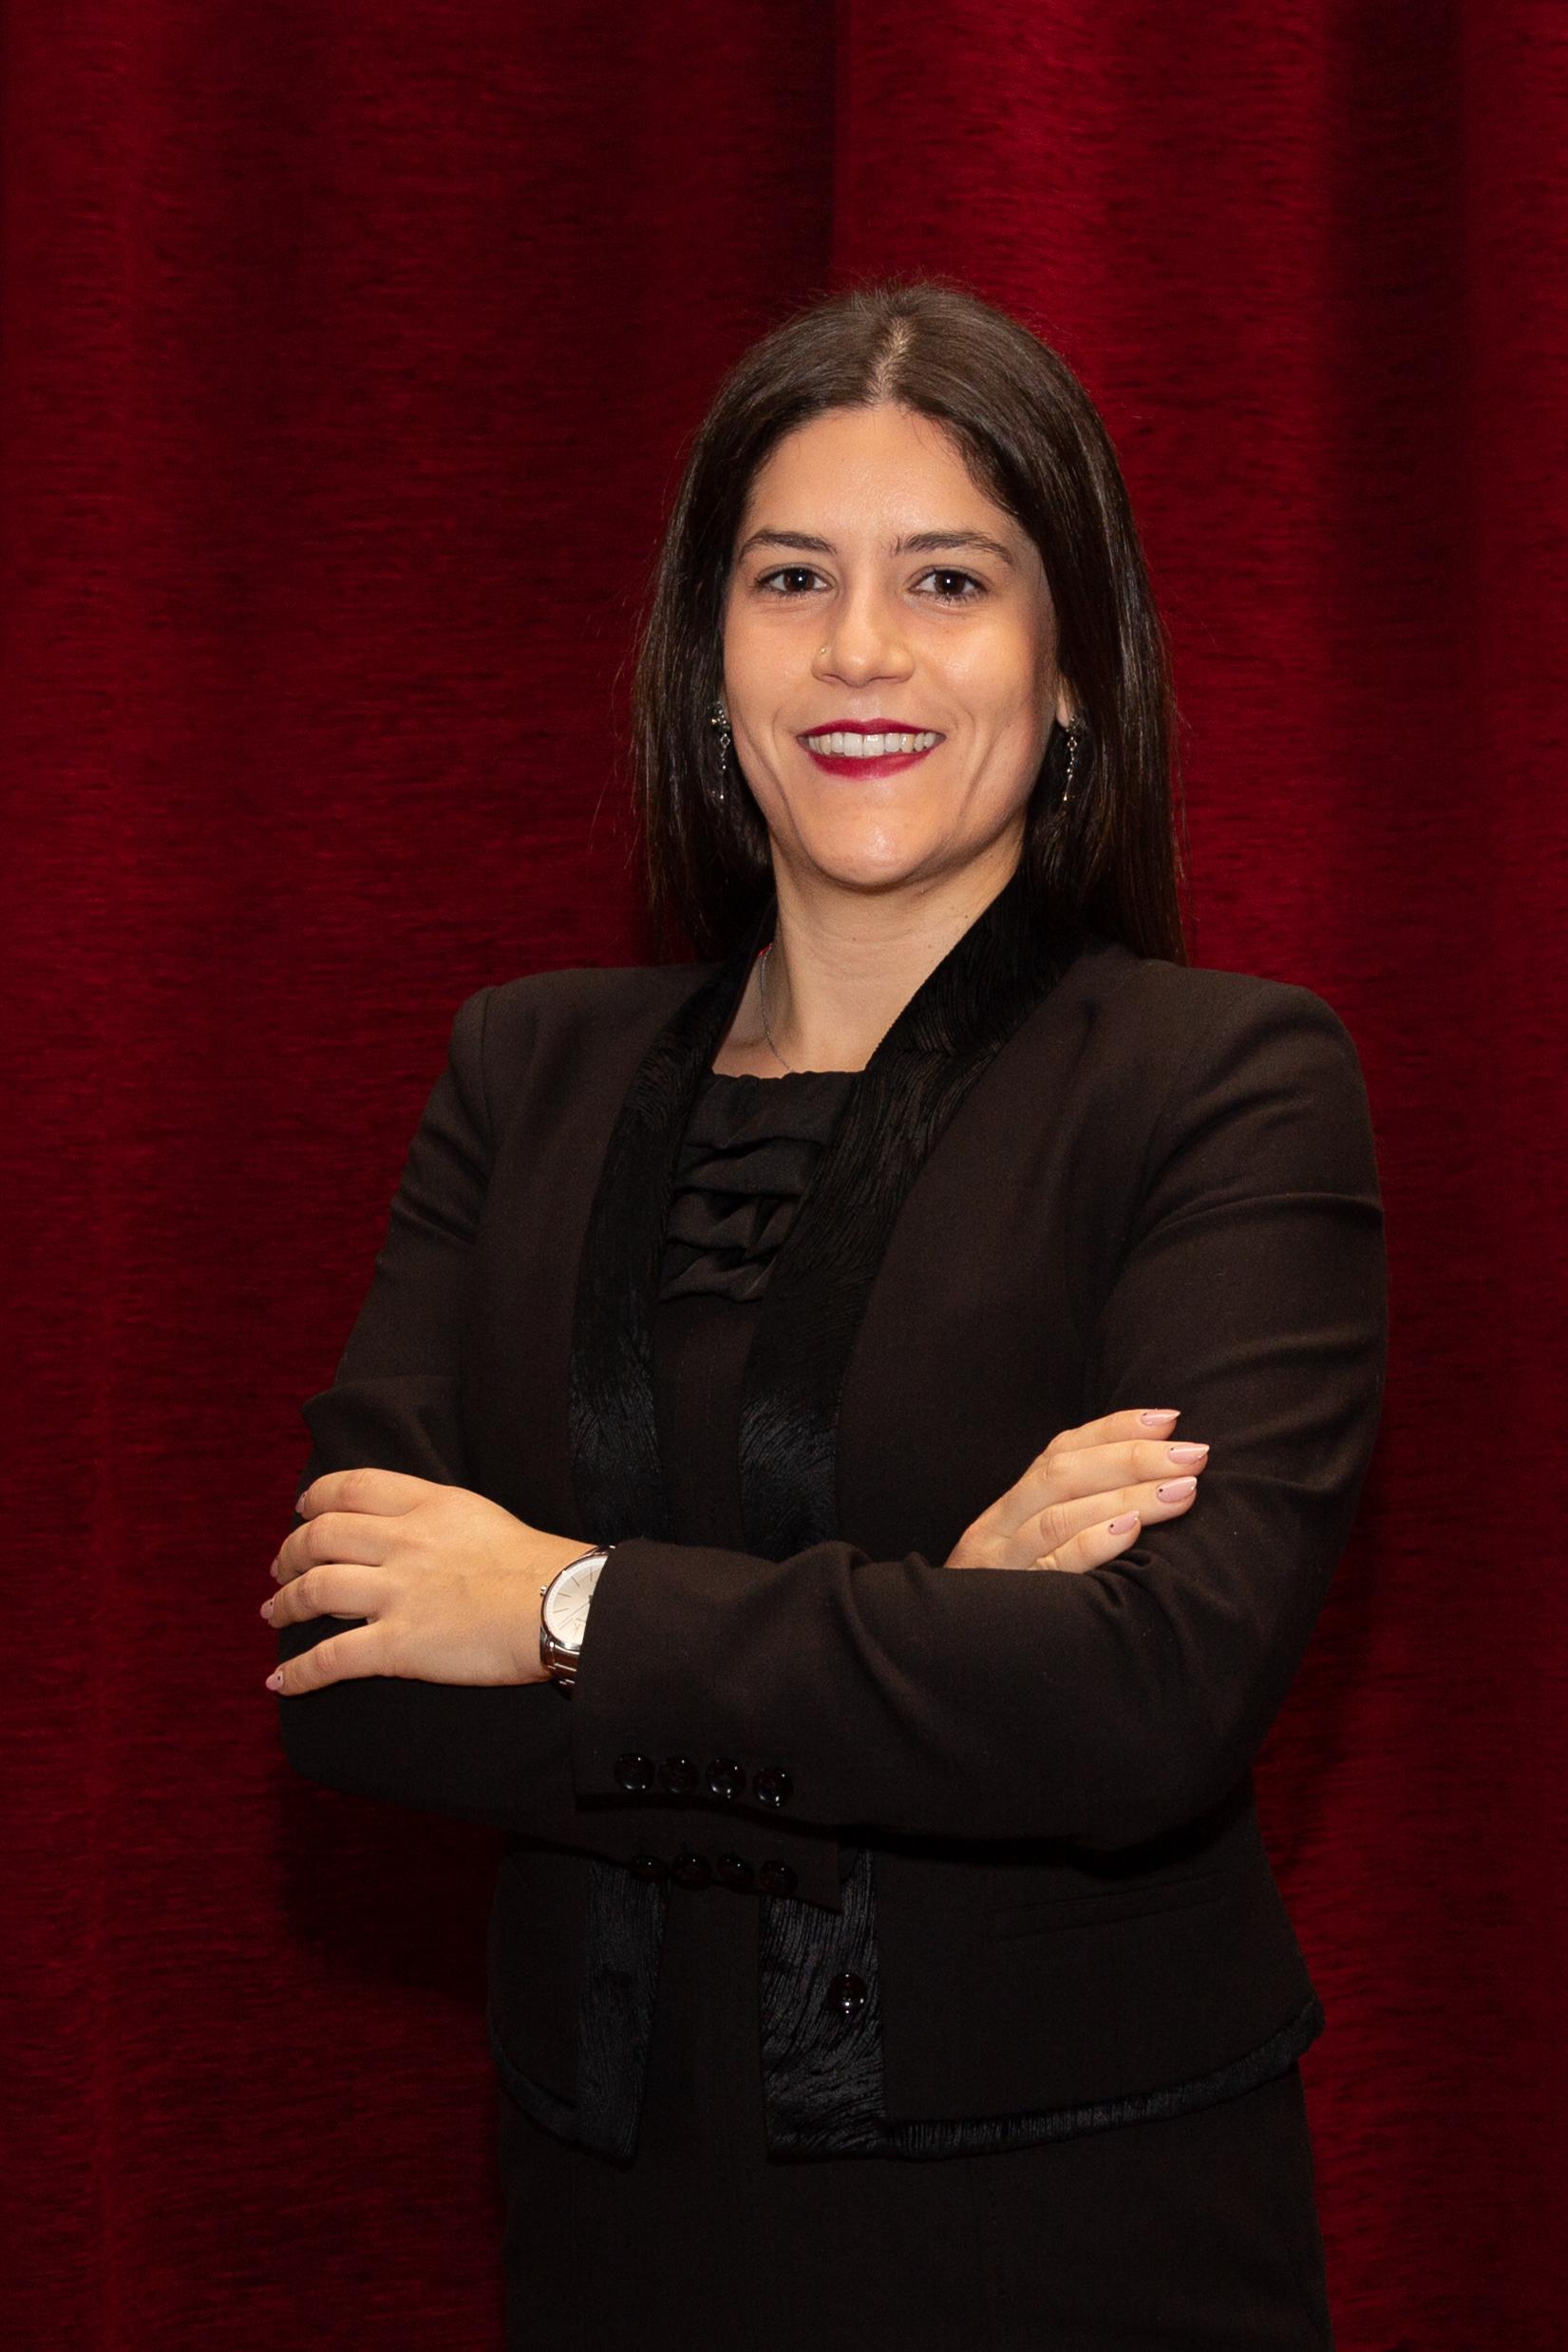 Joana Margarida Boaventura Martins